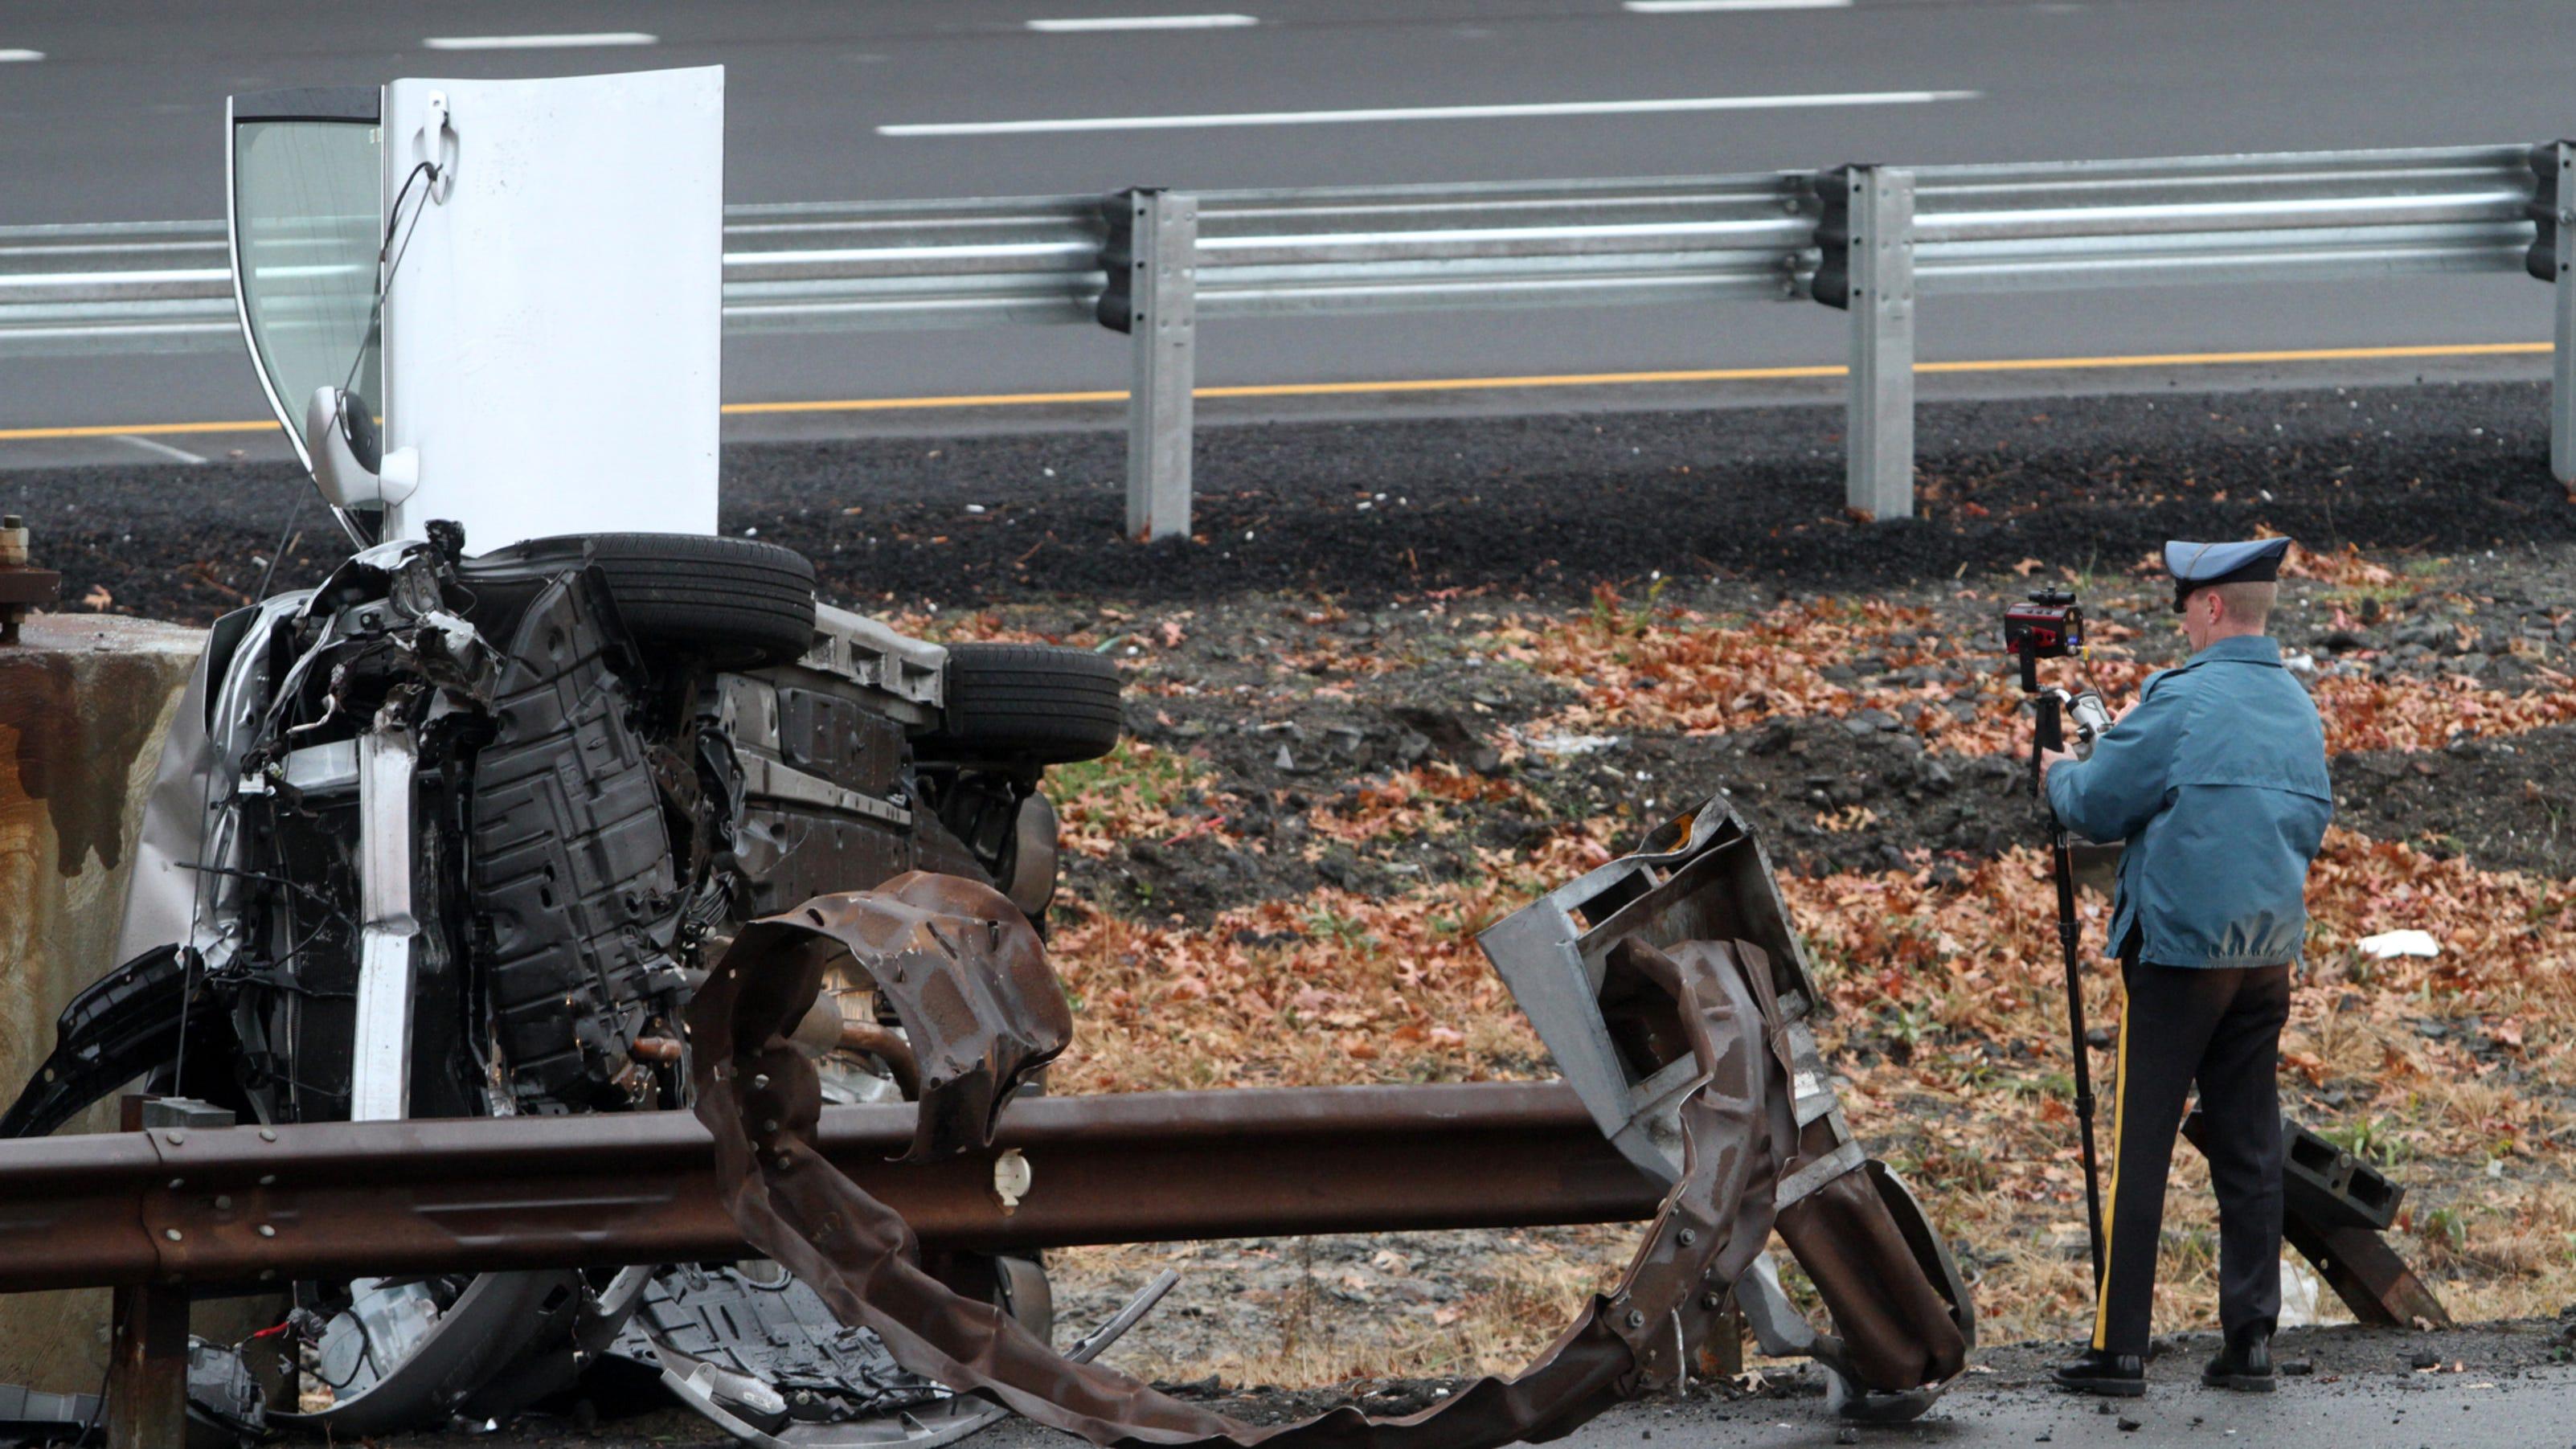 Fatal one vehicle crash on garden state parkway - Accident on garden state parkway north today ...